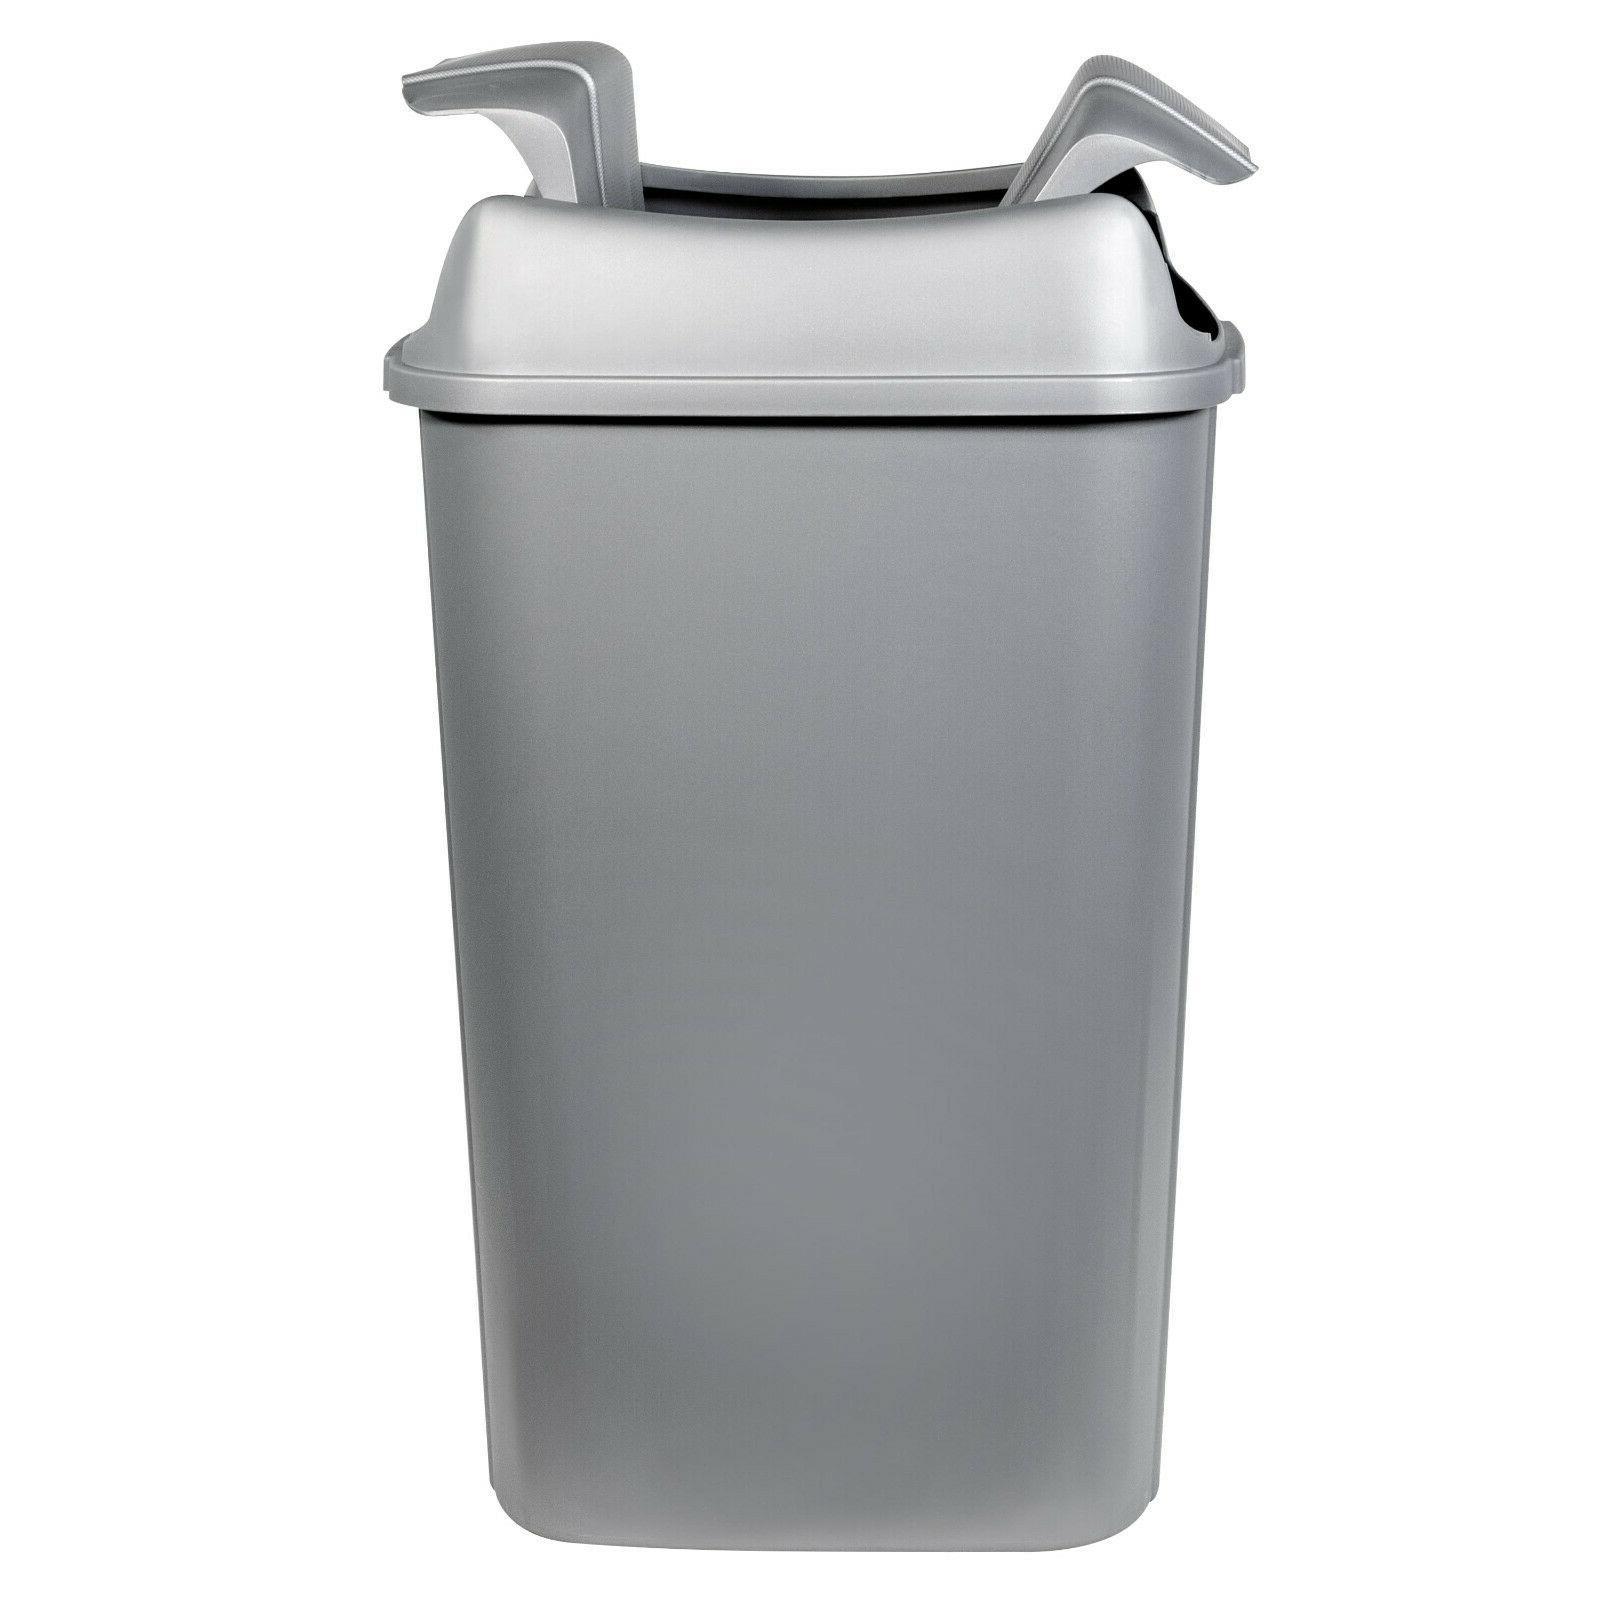 13.3-gallon Hefty Pivot Trash Can, Decorative